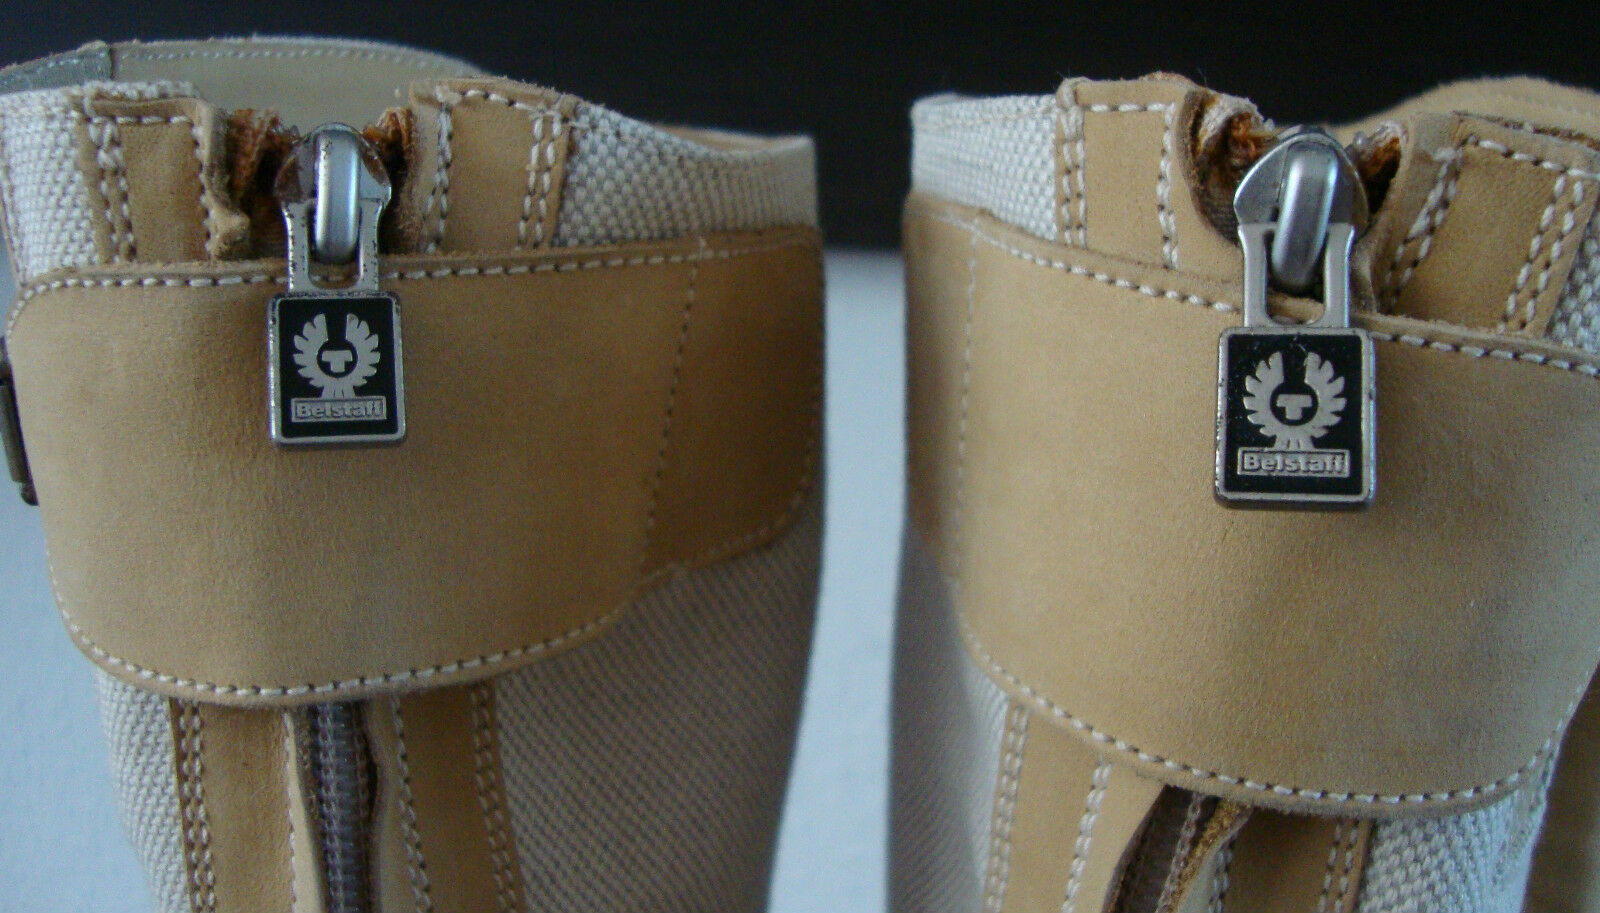 Belstaff nakedmaster 1955 light natural botas señora botas de cuero nuevo